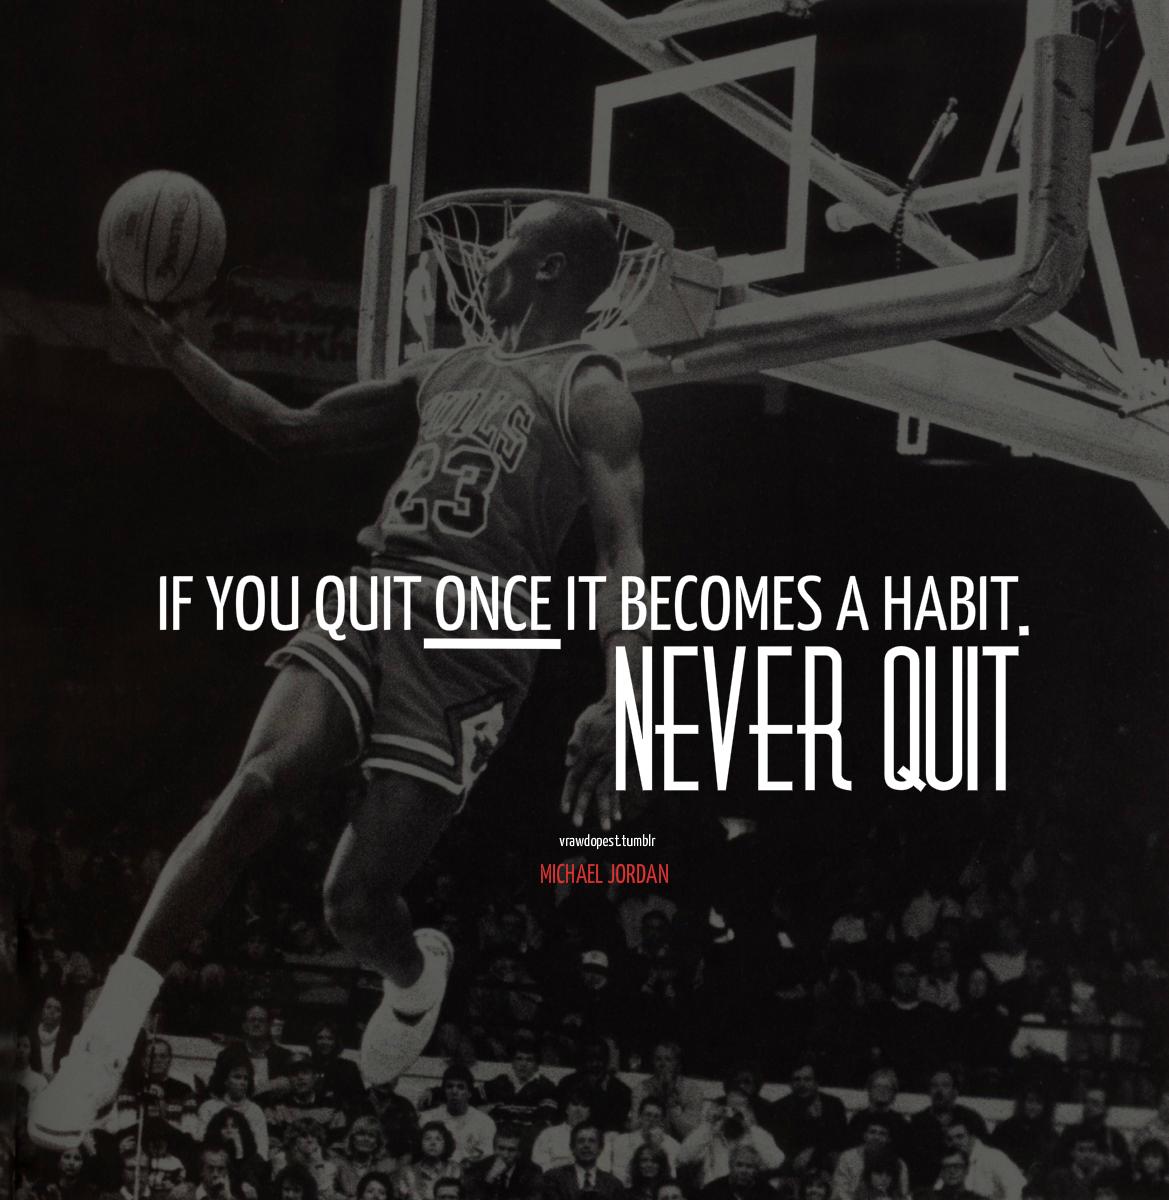 Quotes By Michael Jordan Quotes Michael Jordan  Total Wellness